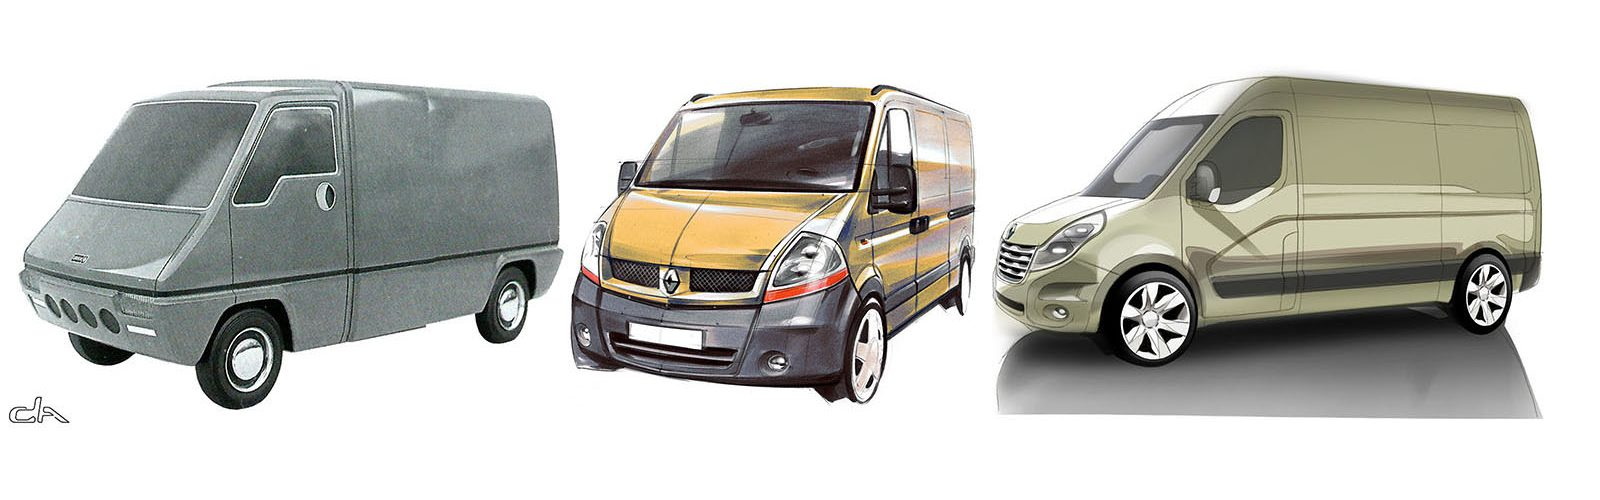 Couv Renault Master